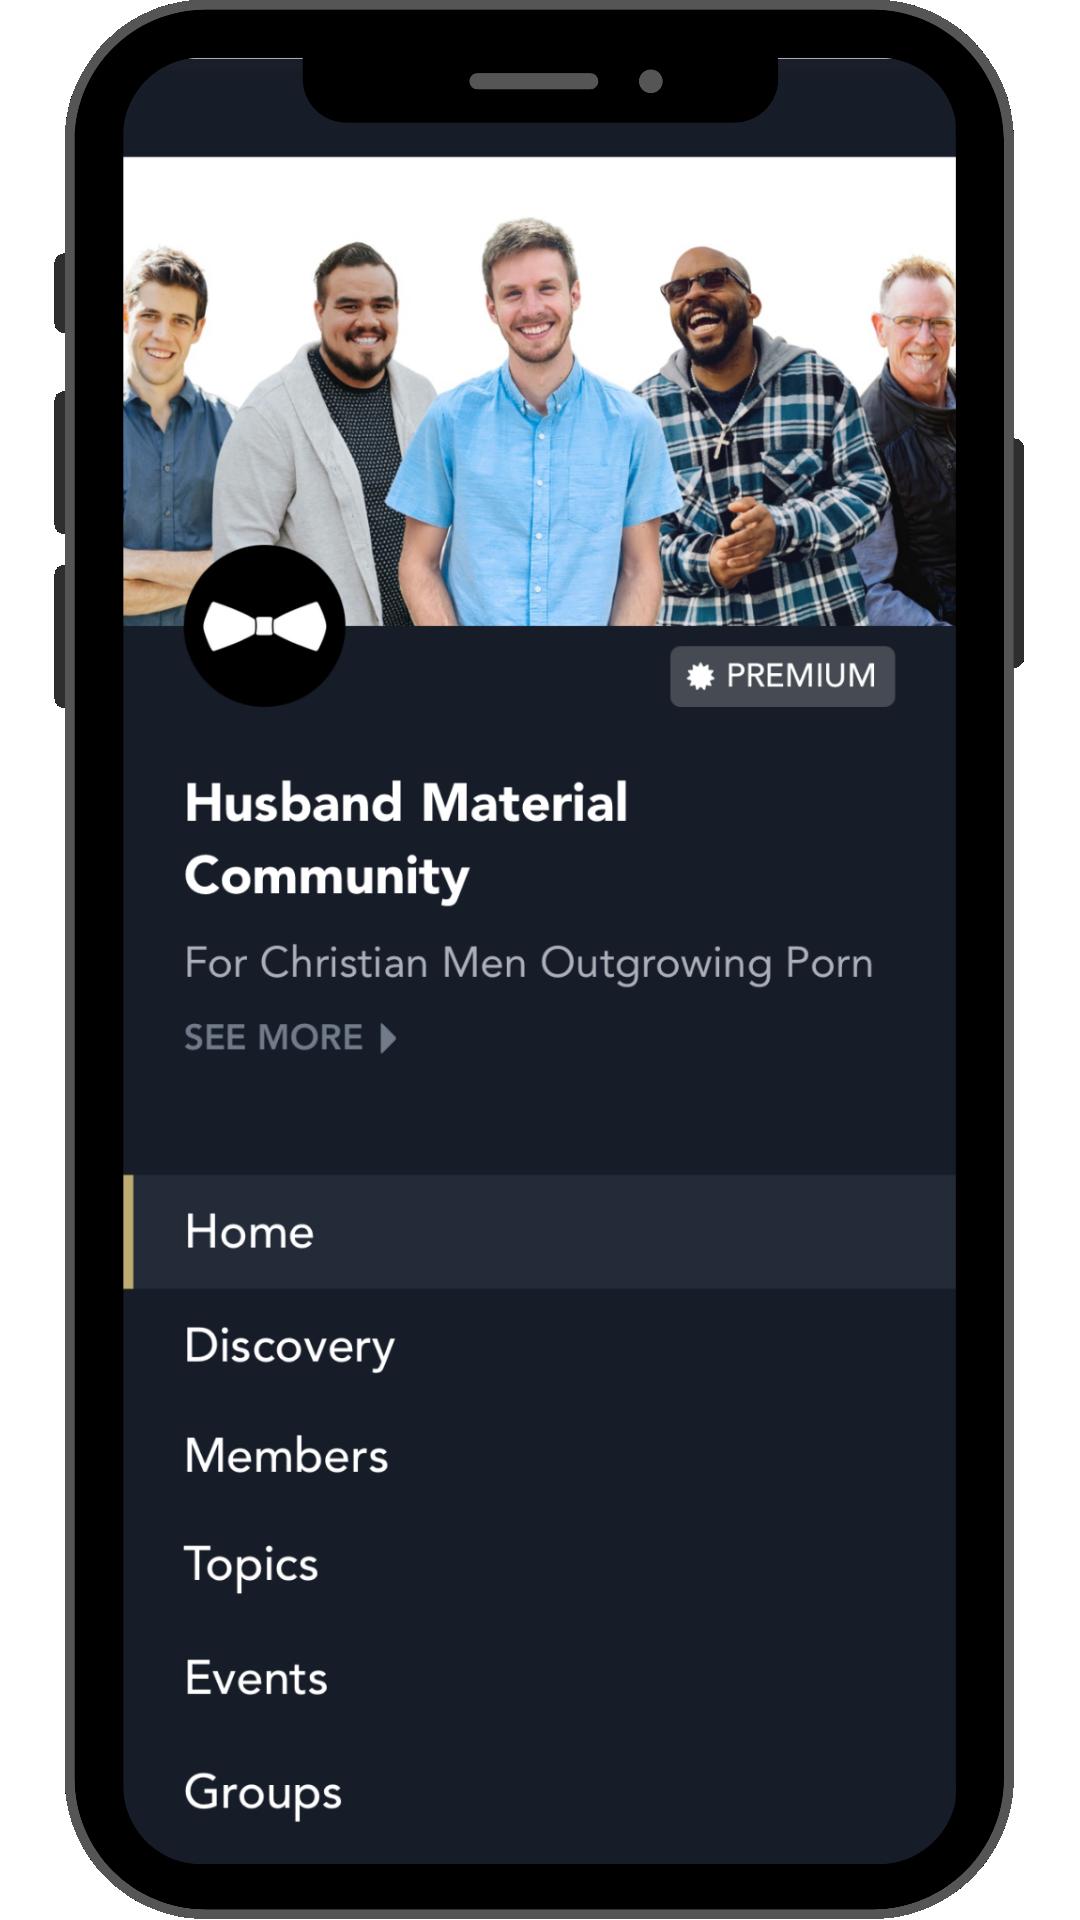 Husband Material Community